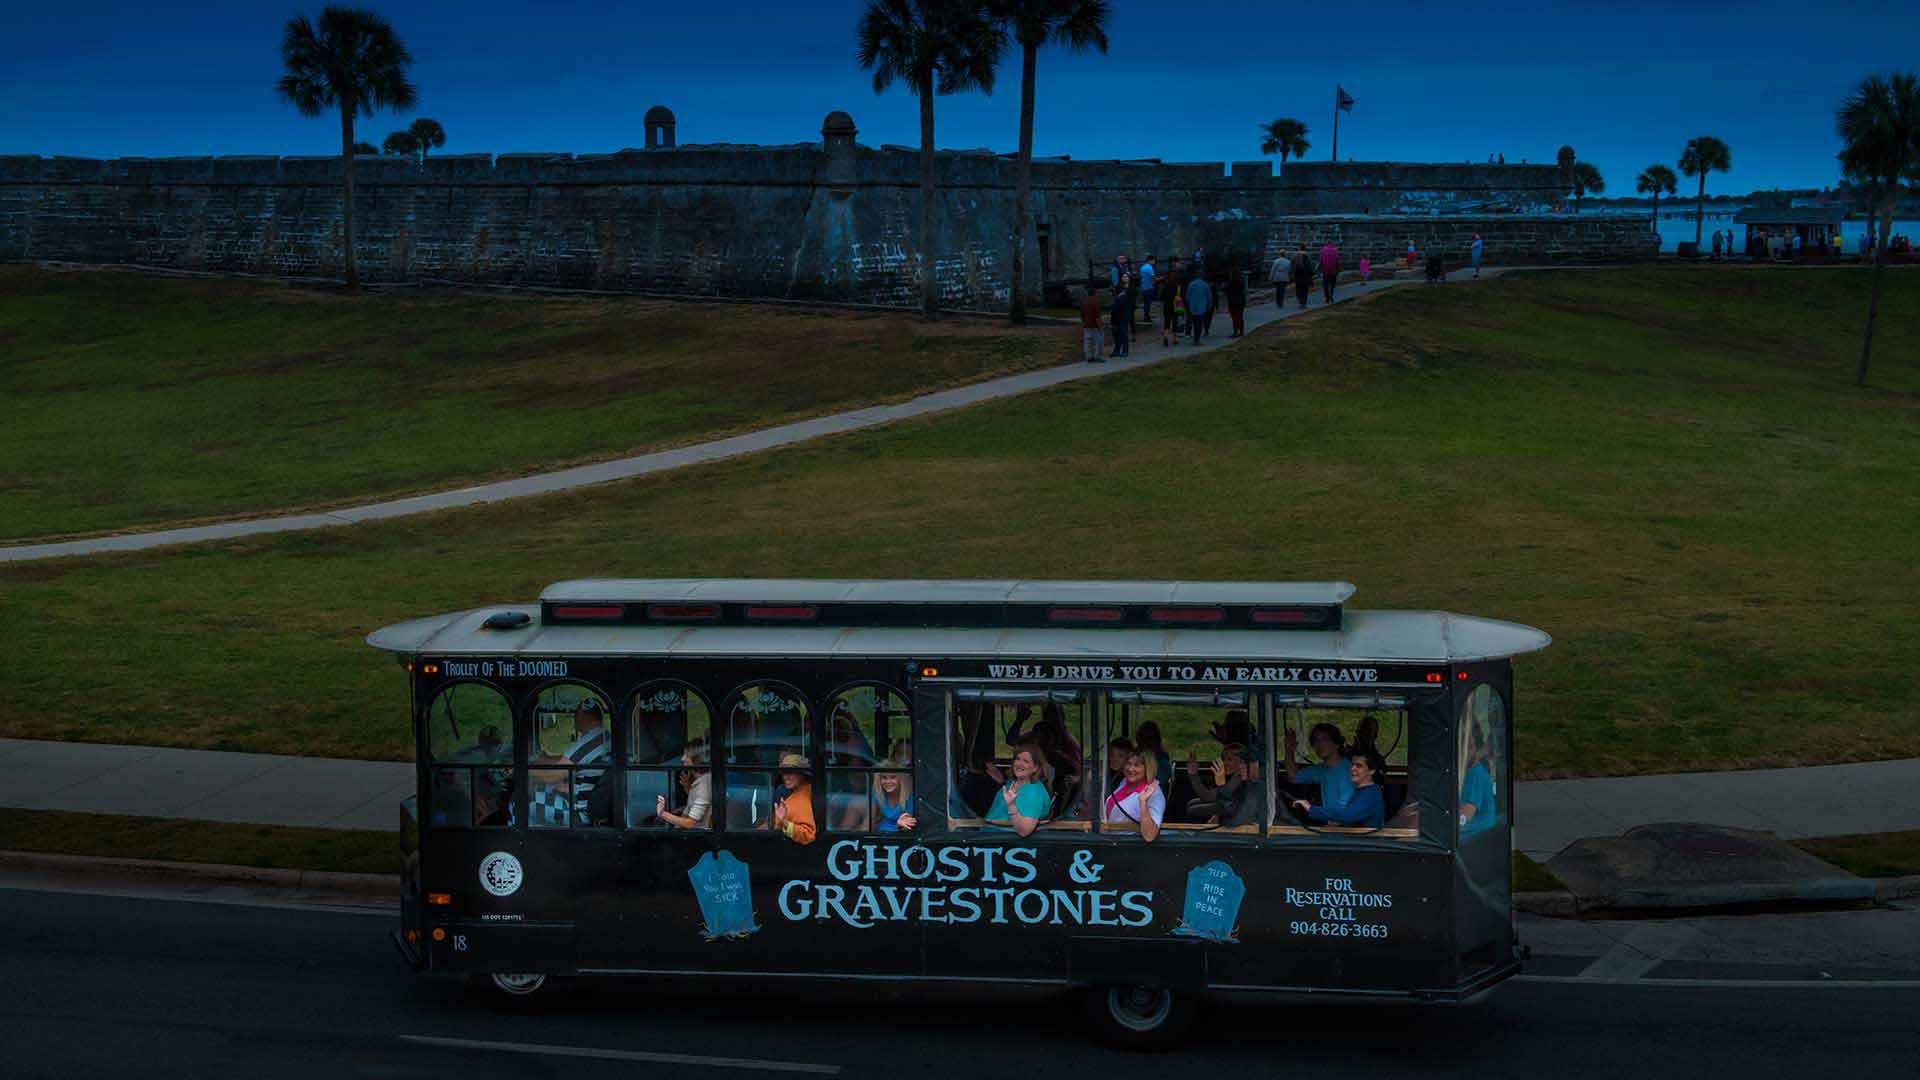 st augustine haunted tour trolley at castillo de san marcos